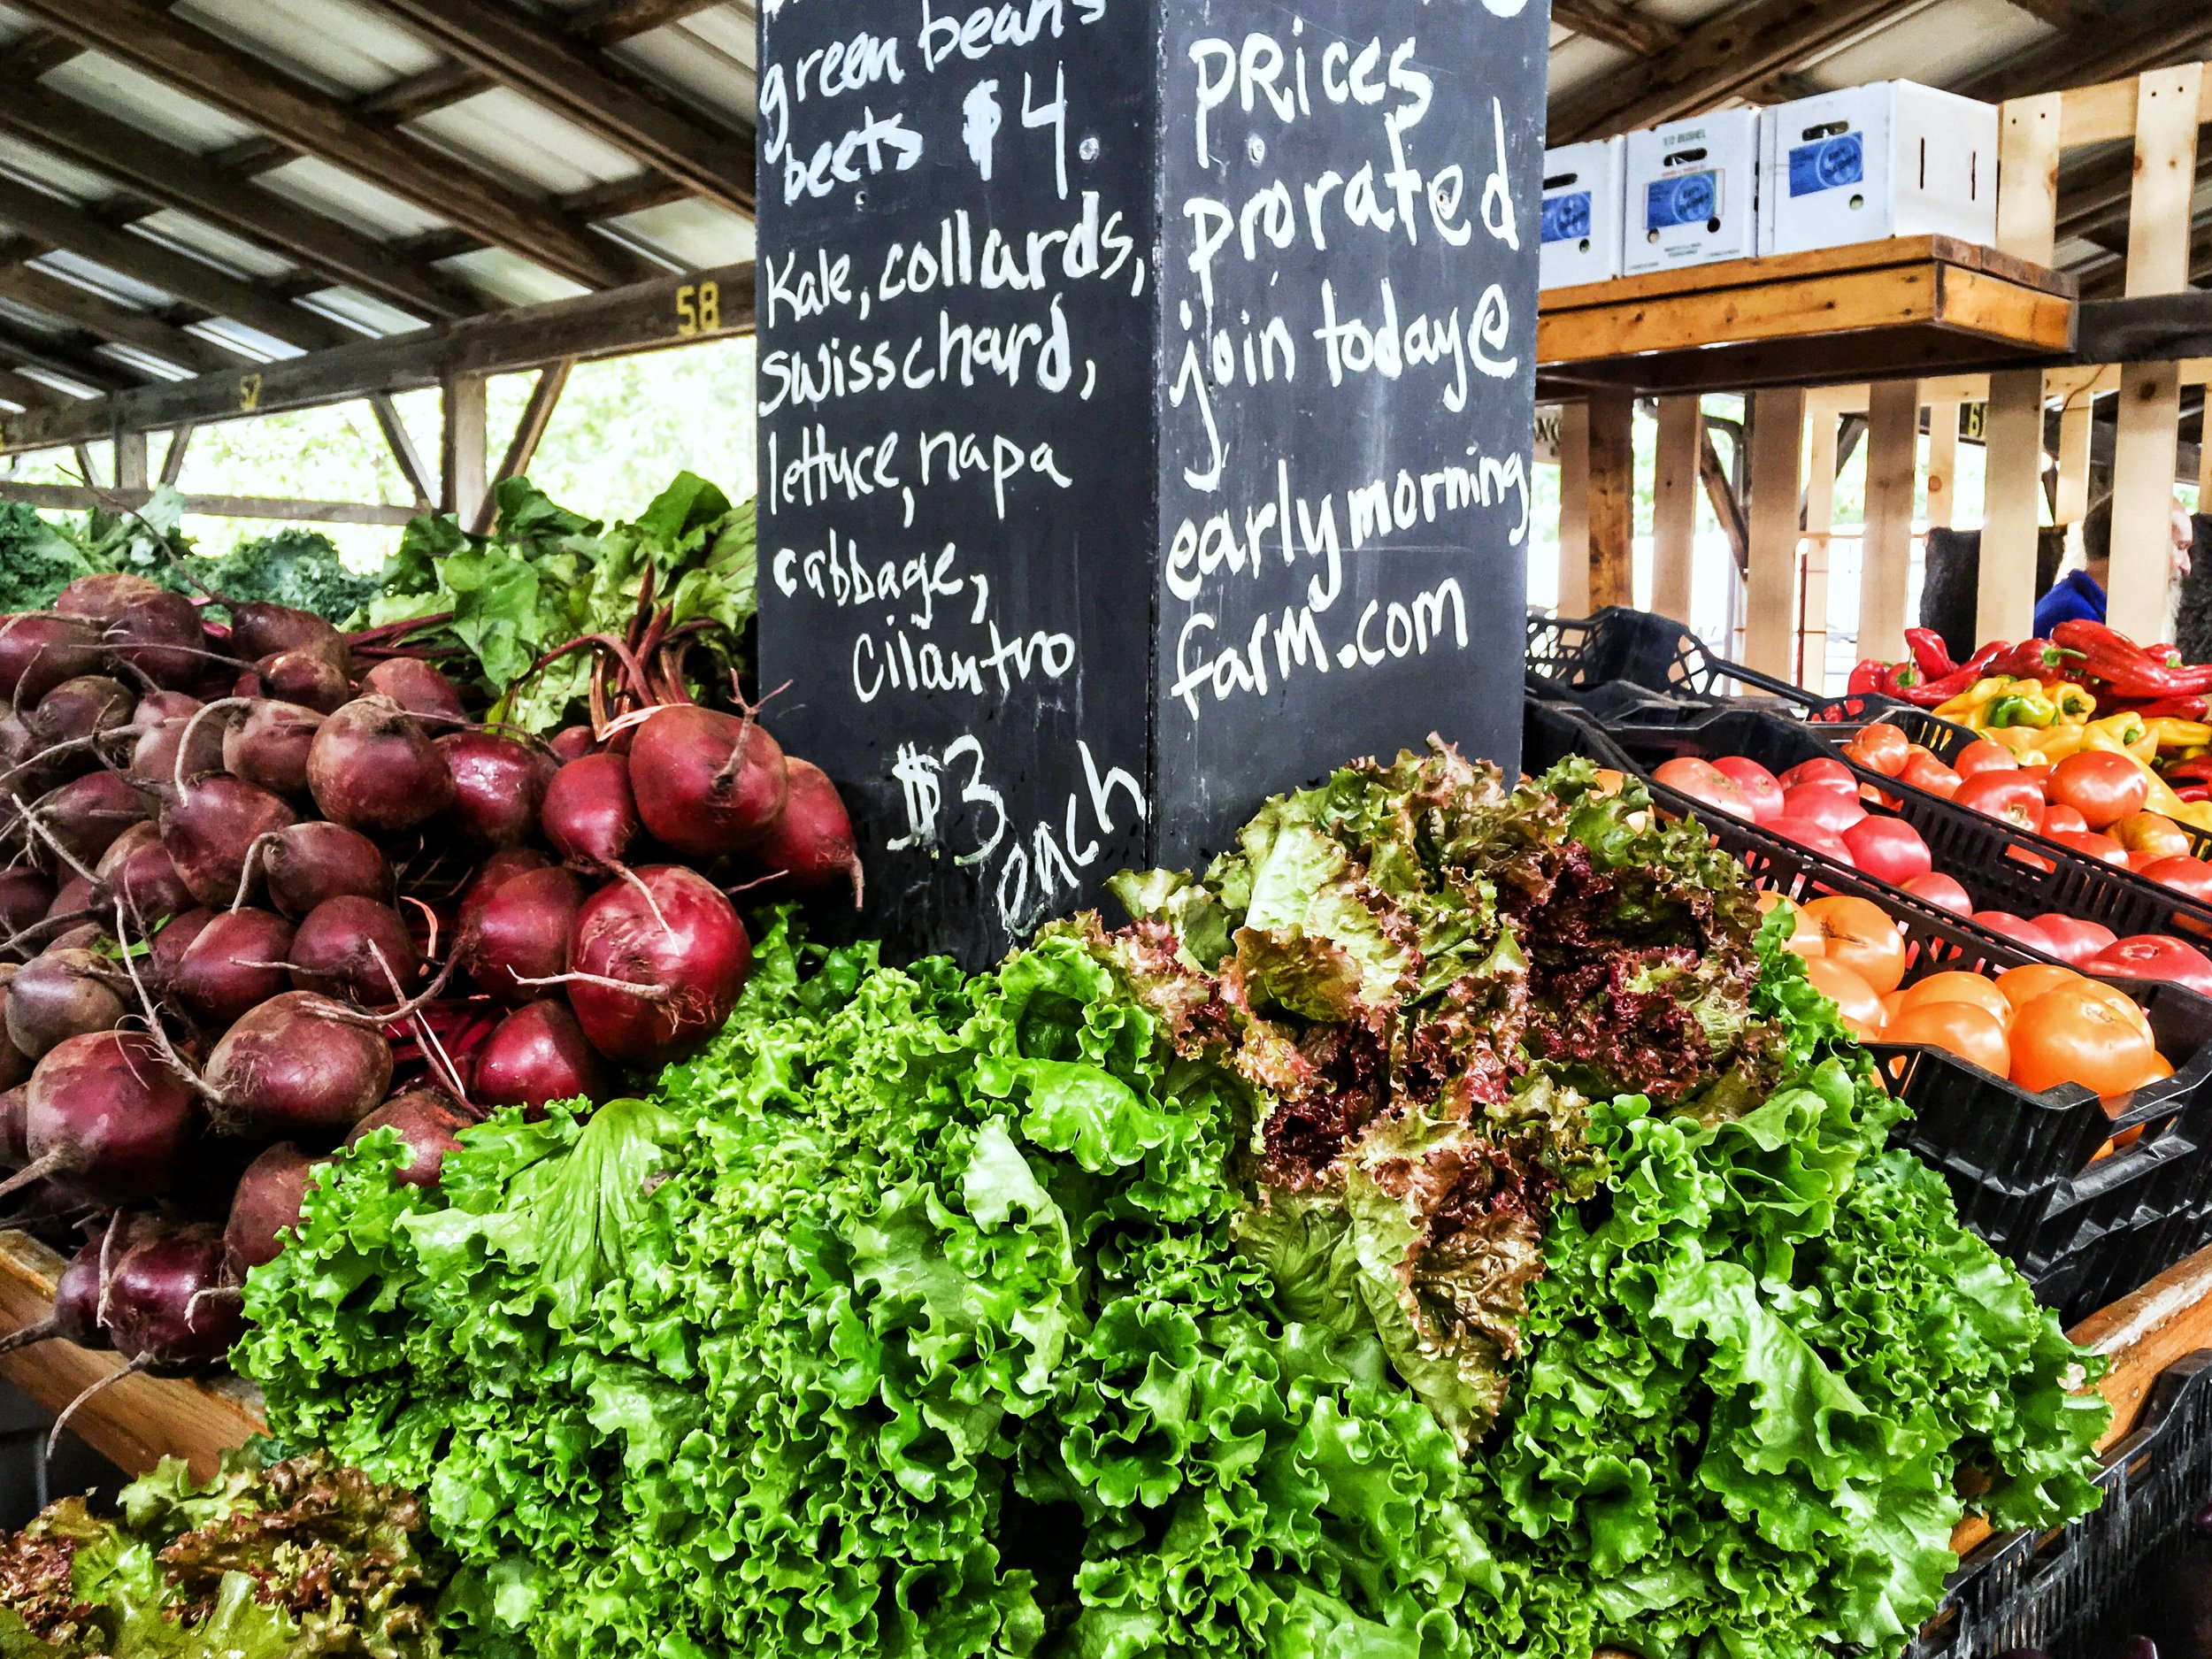 Farmers Market - Fresh Produce